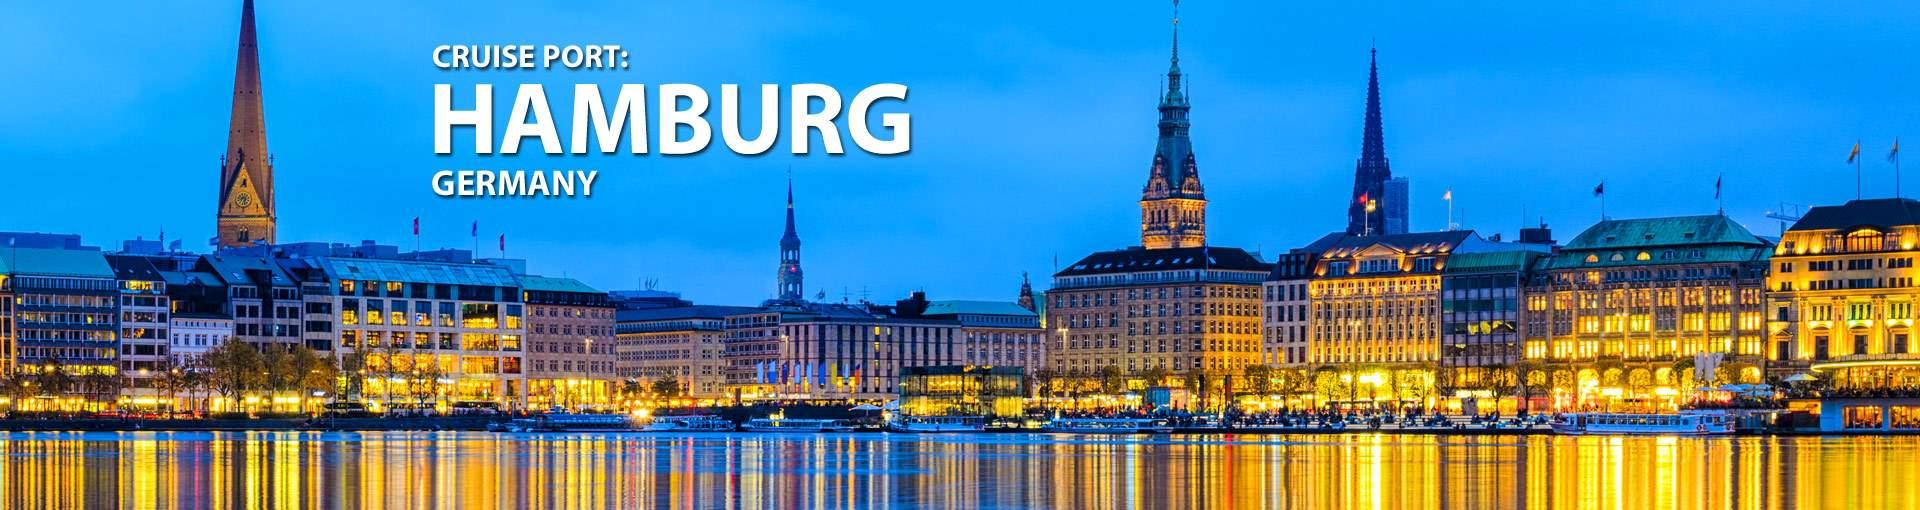 Cruises from Hamburg, Germany